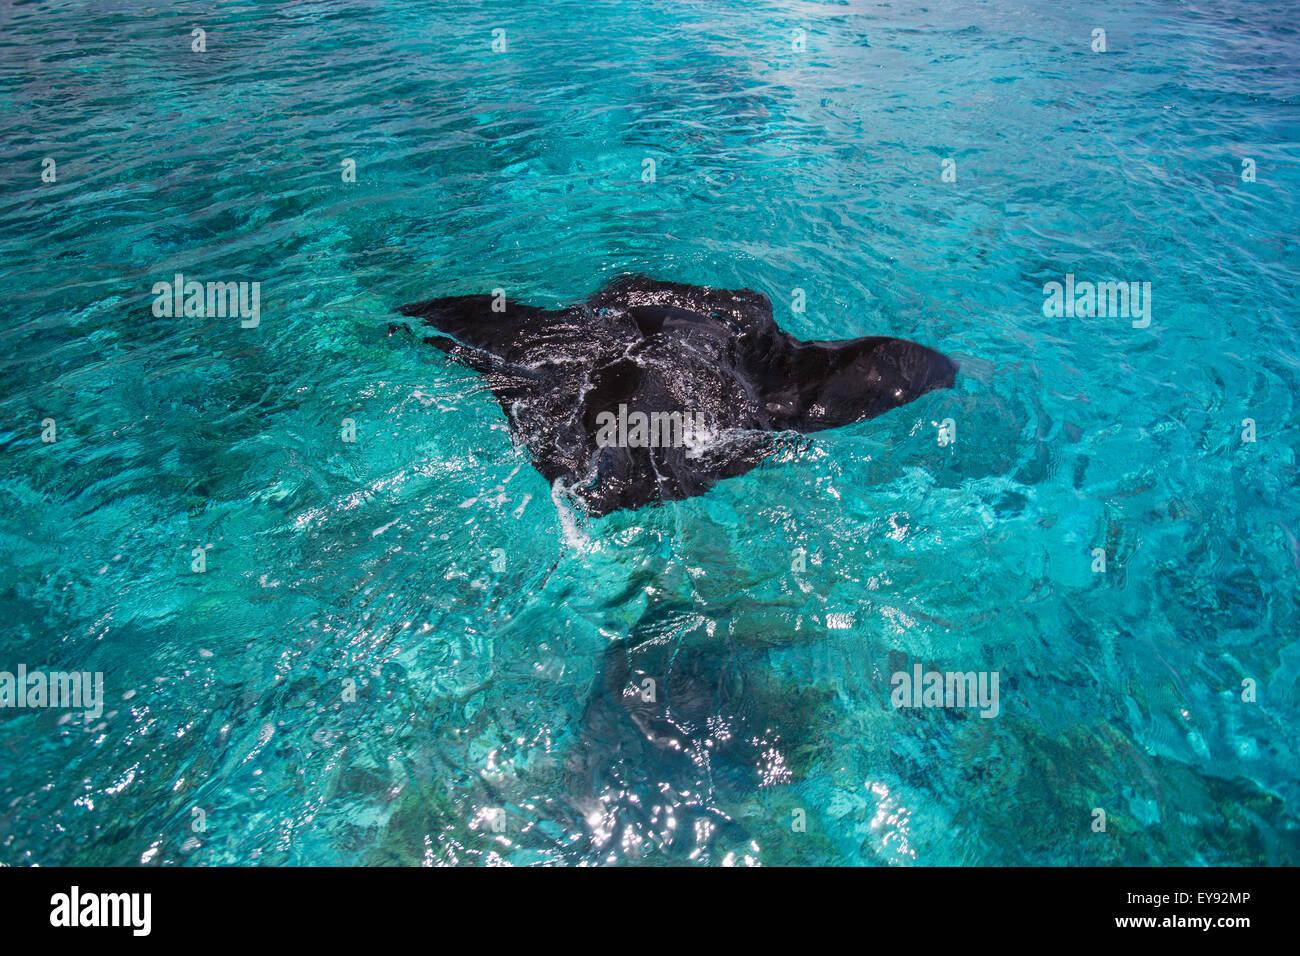 hight resolution of manta ray swimming in the ocean water tahiti stock image